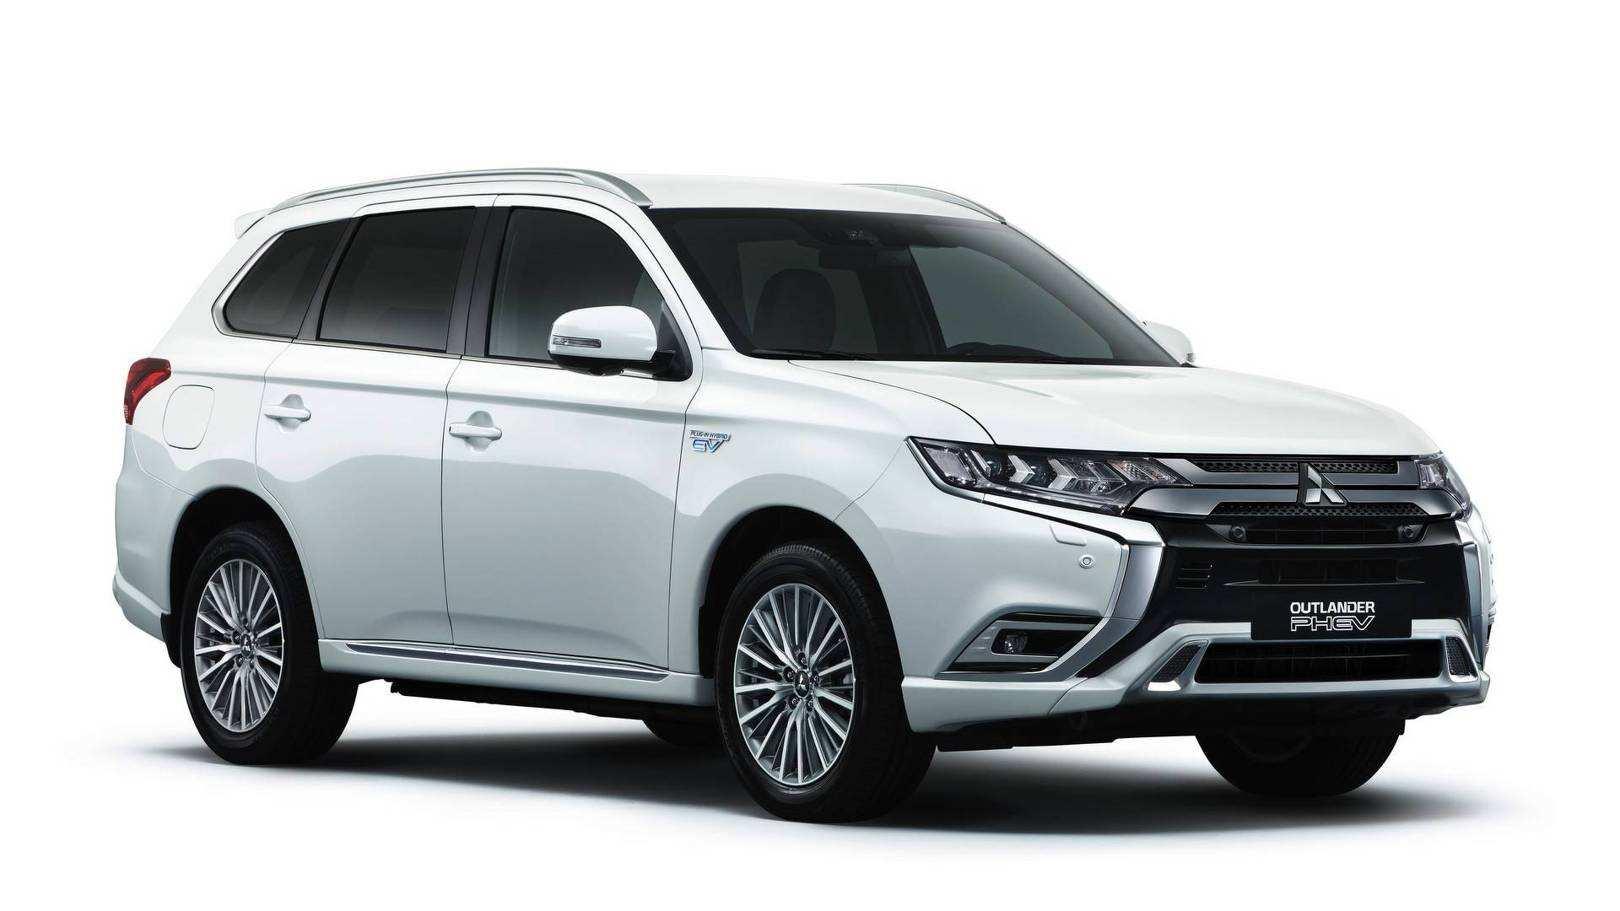 96 New 2019 Mitsubishi Asx Pricing by 2019 Mitsubishi Asx